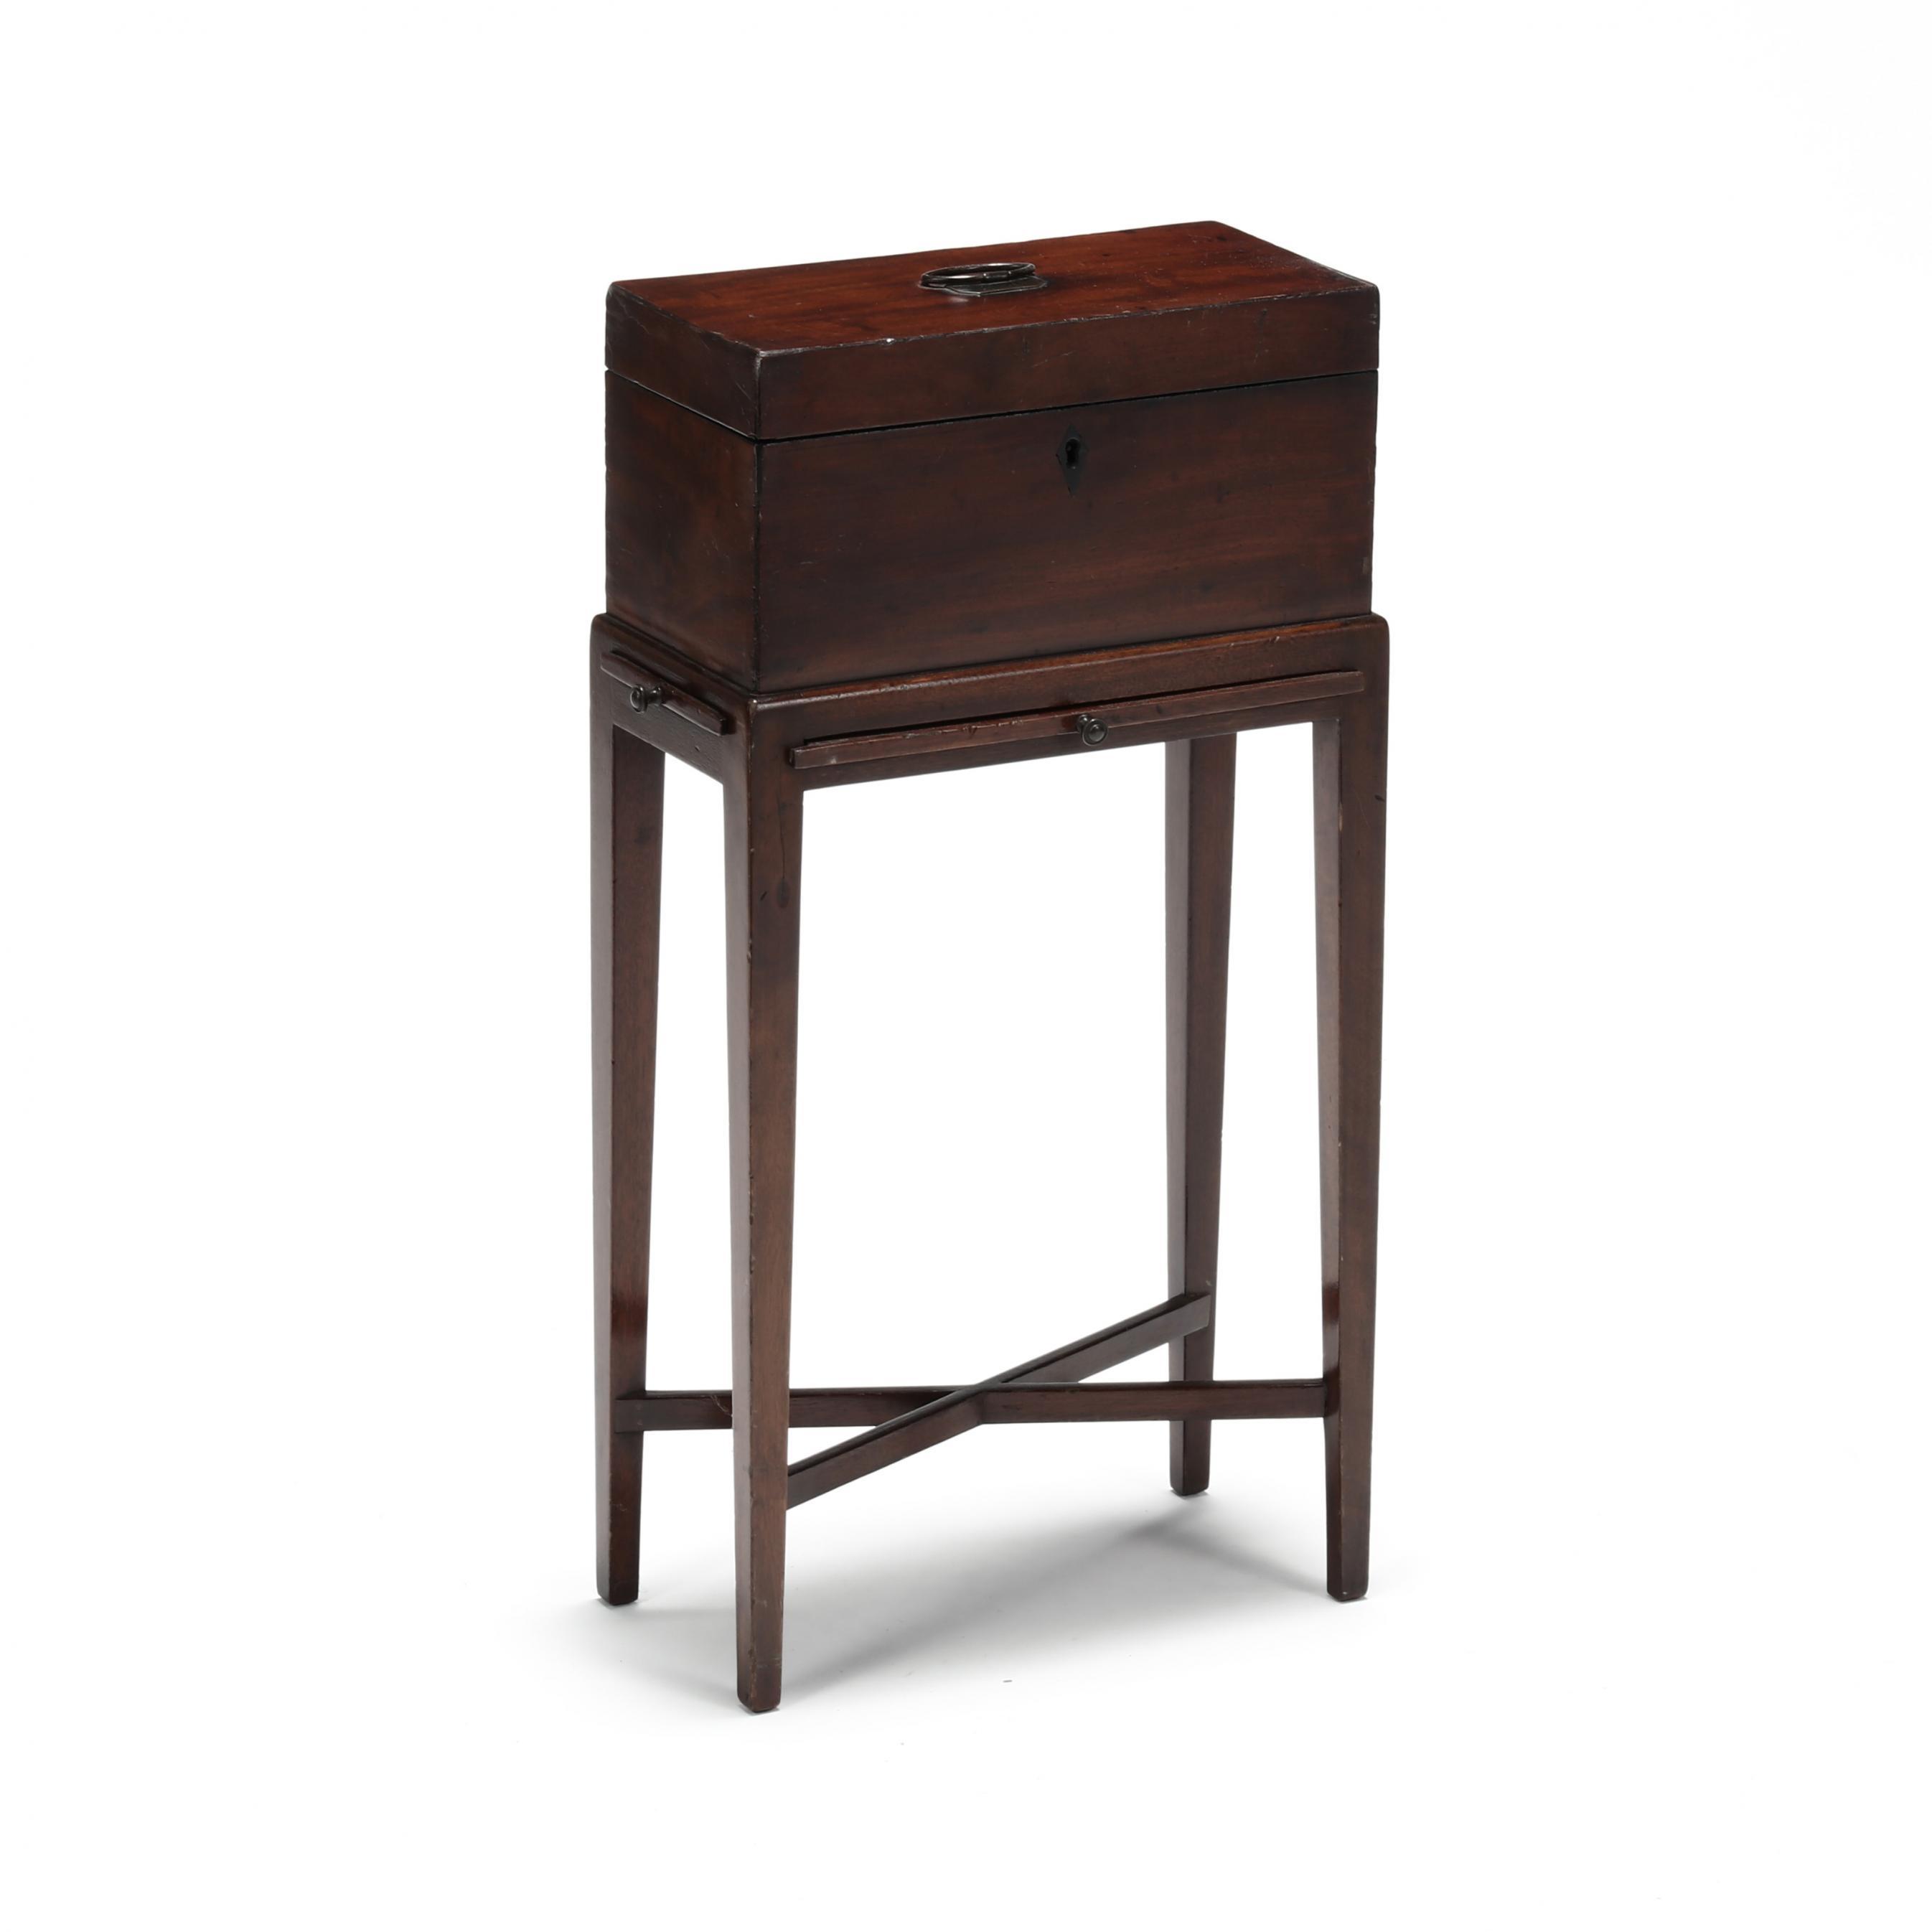 georgian-mahogany-tea-caddy-on-stand